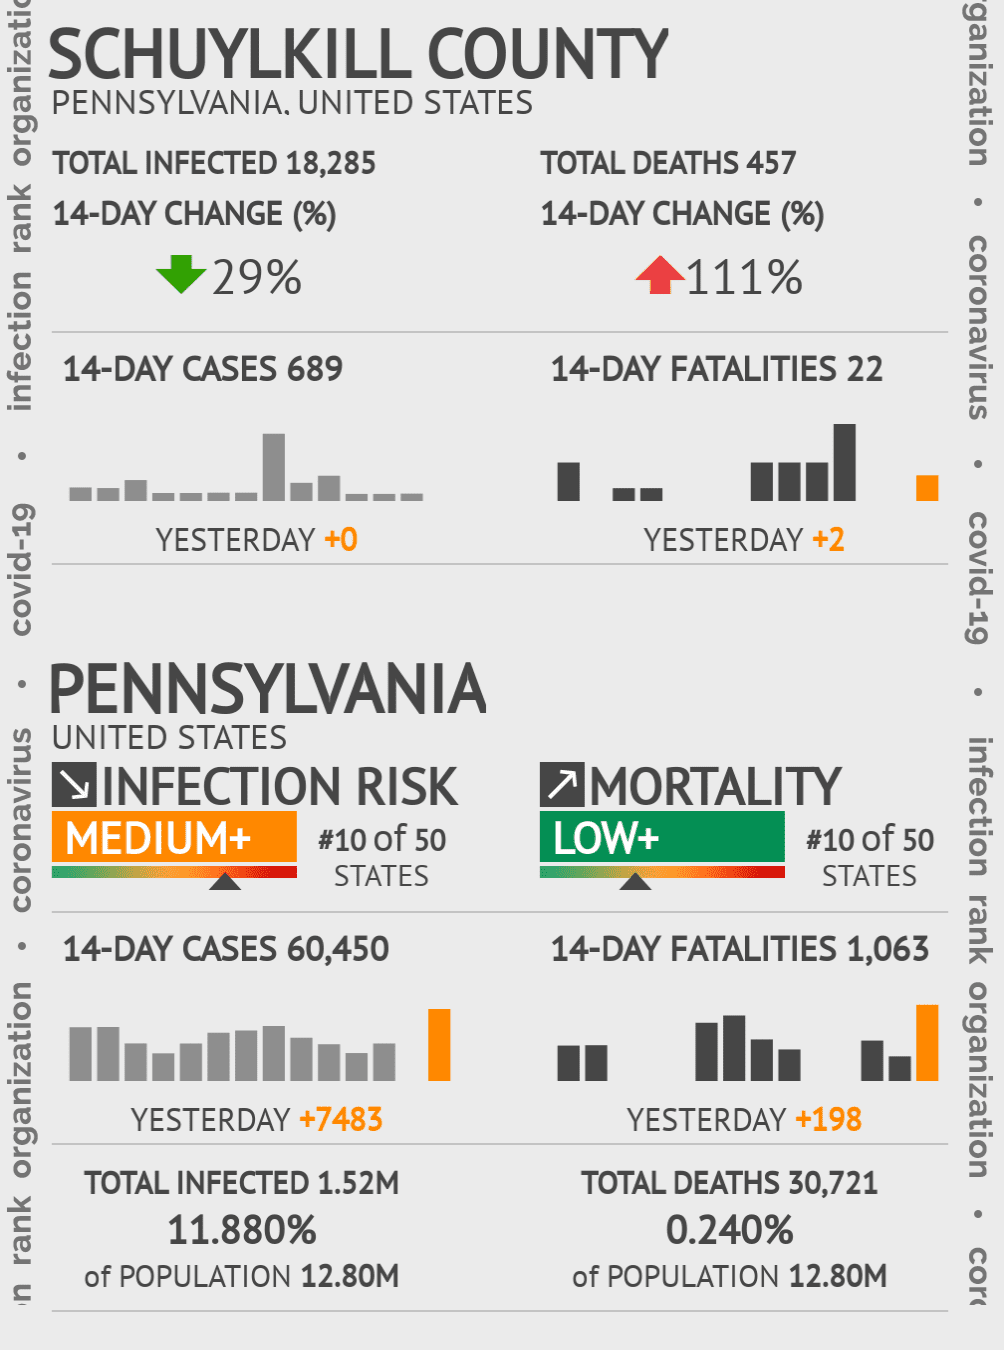 Schuylkill County Coronavirus Covid-19 Risk of Infection on October 22, 2020